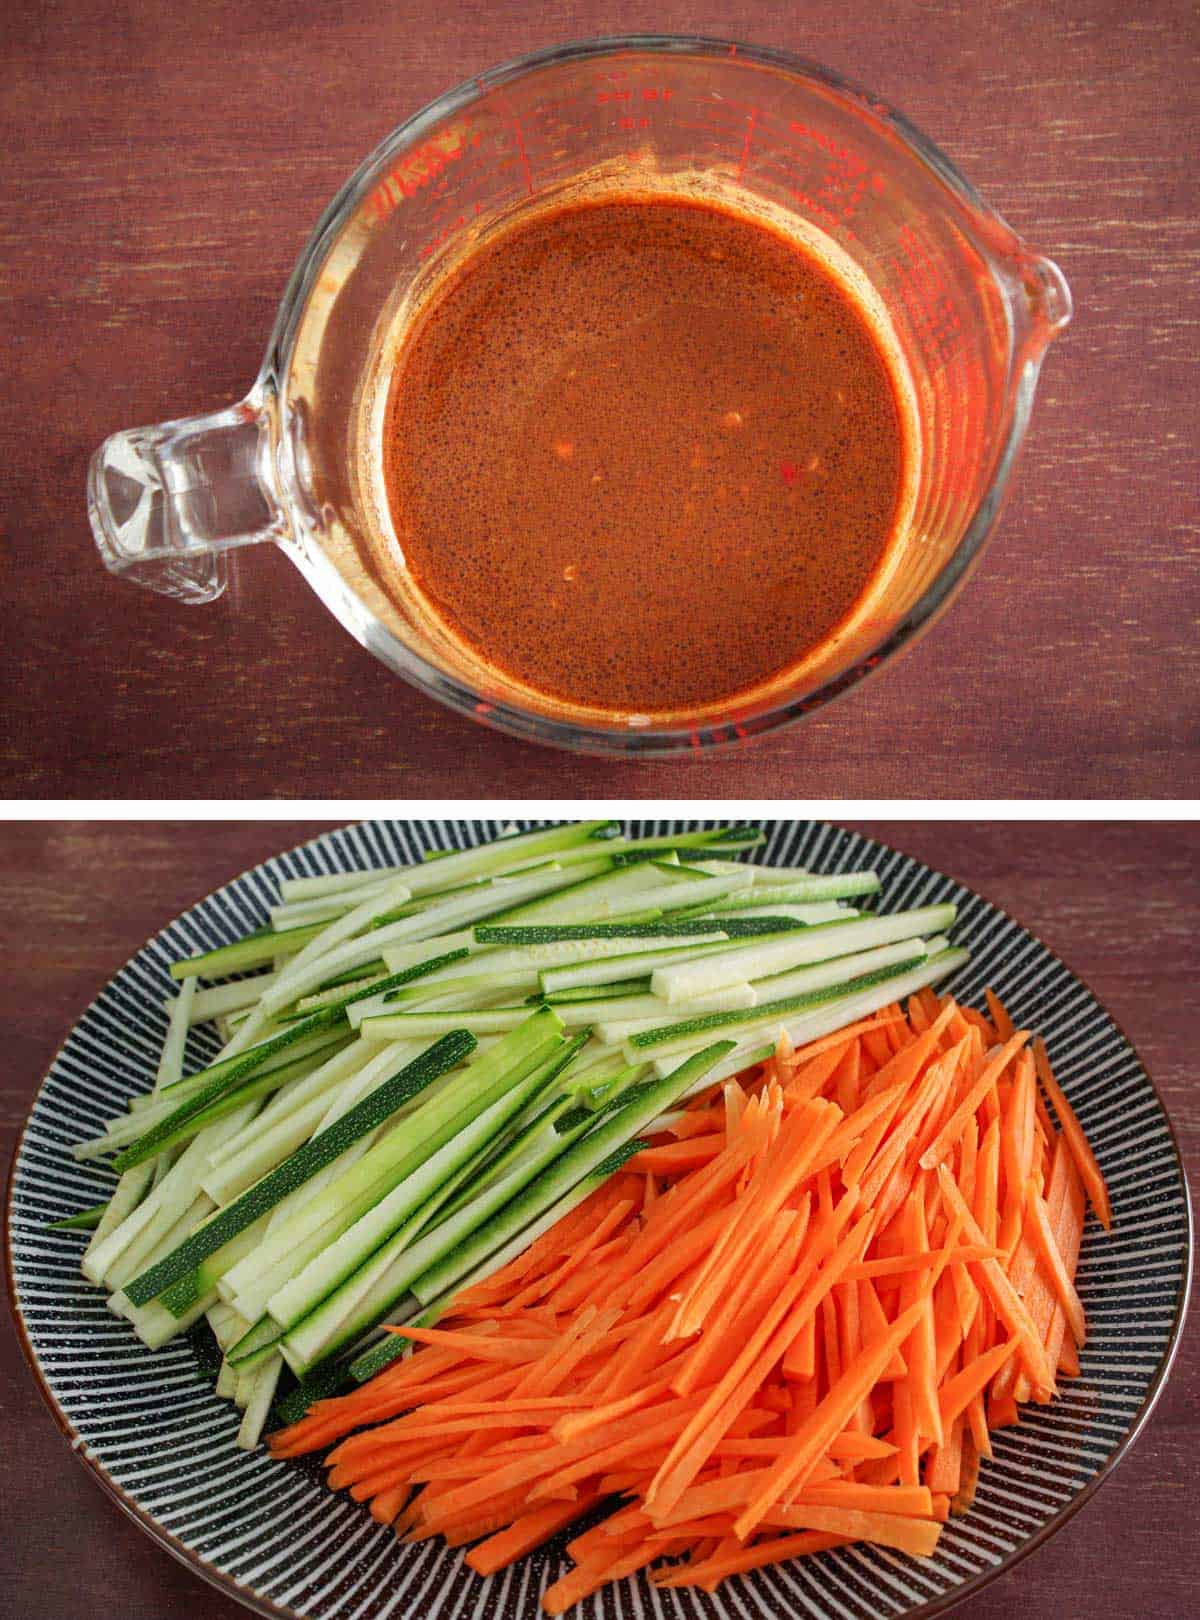 Prepared Peanut Dressing and Julienned Vegetables